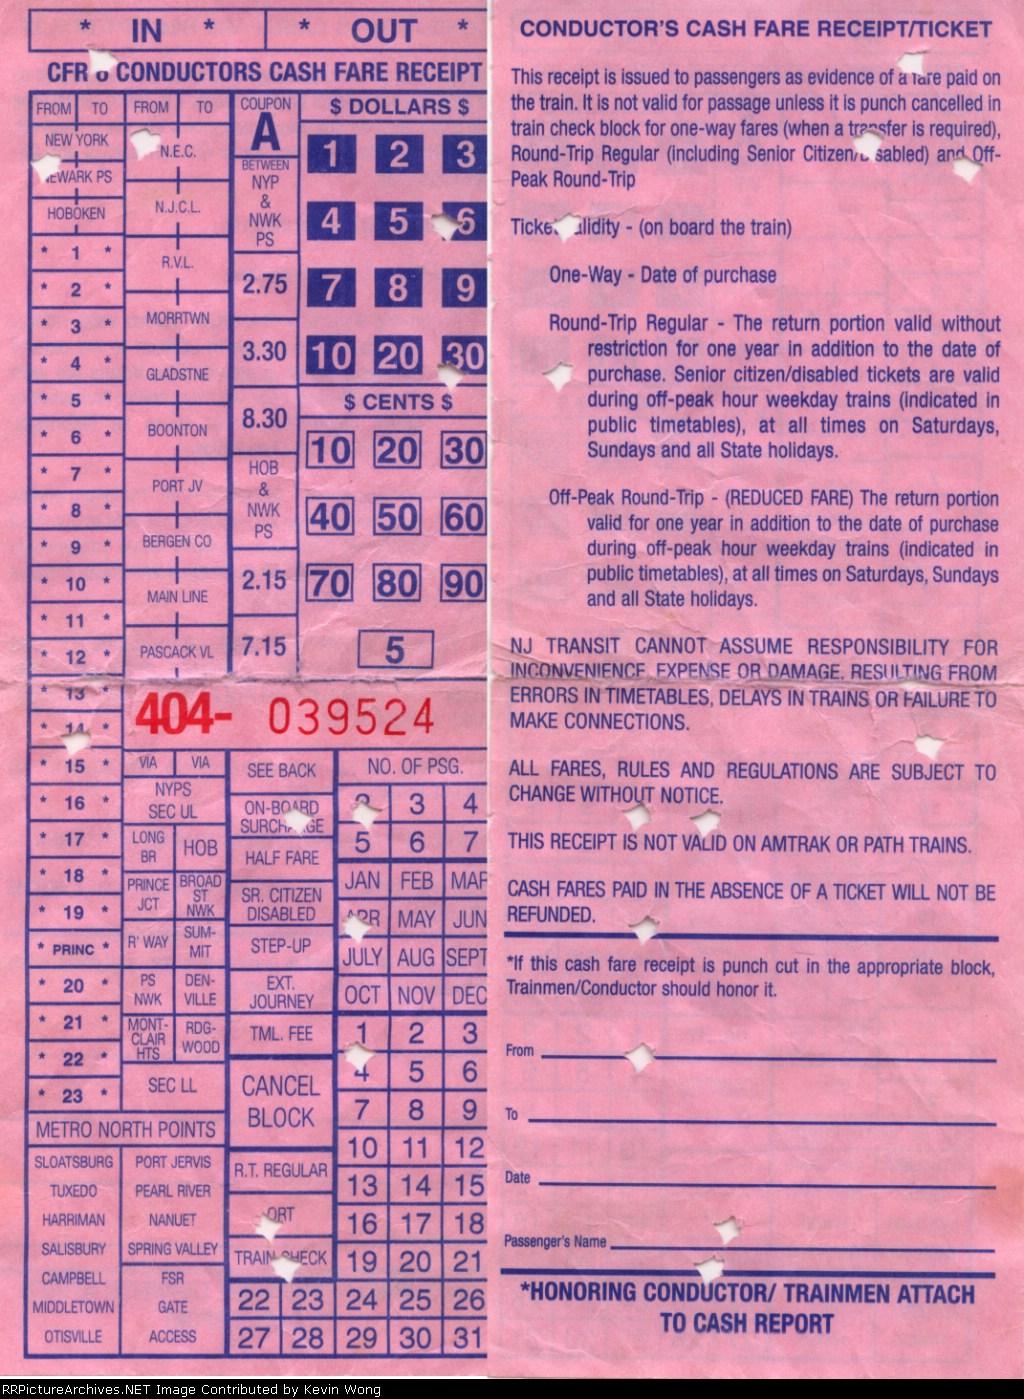 on board cash fare receipt